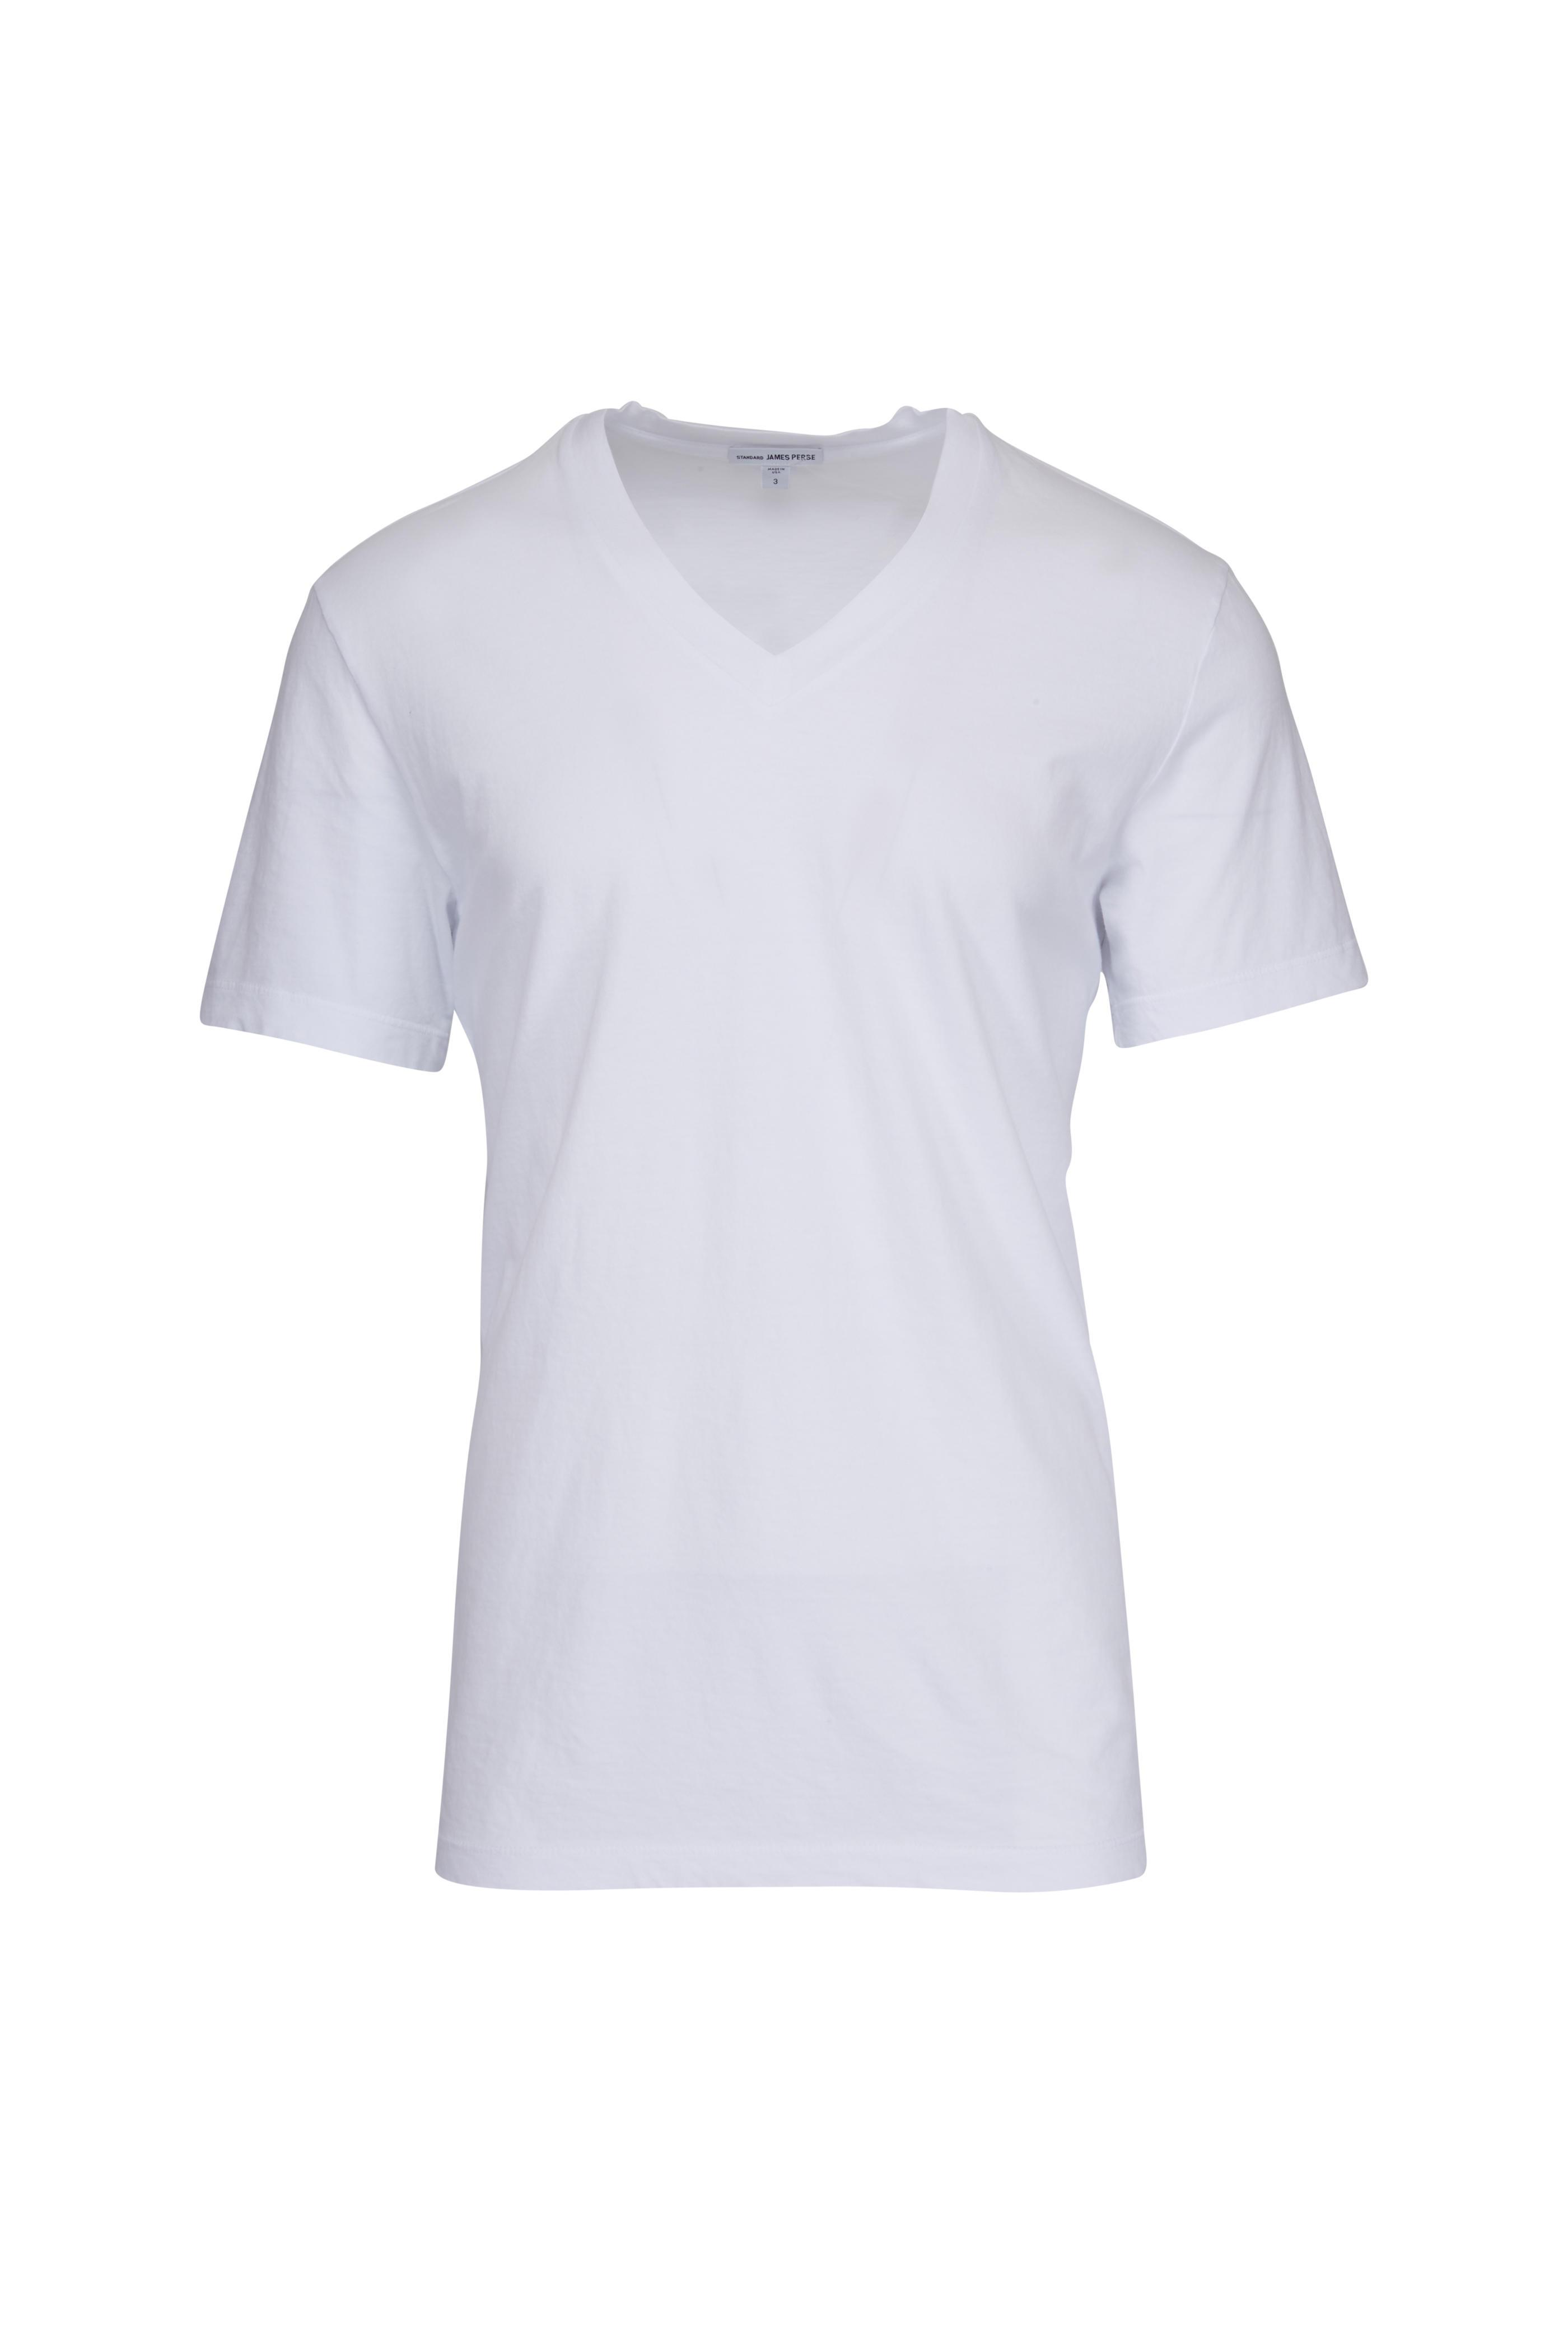 d8cbb52cc22 James Perse - White Cotton V-Neck T-Shirt   Mitchell Stores